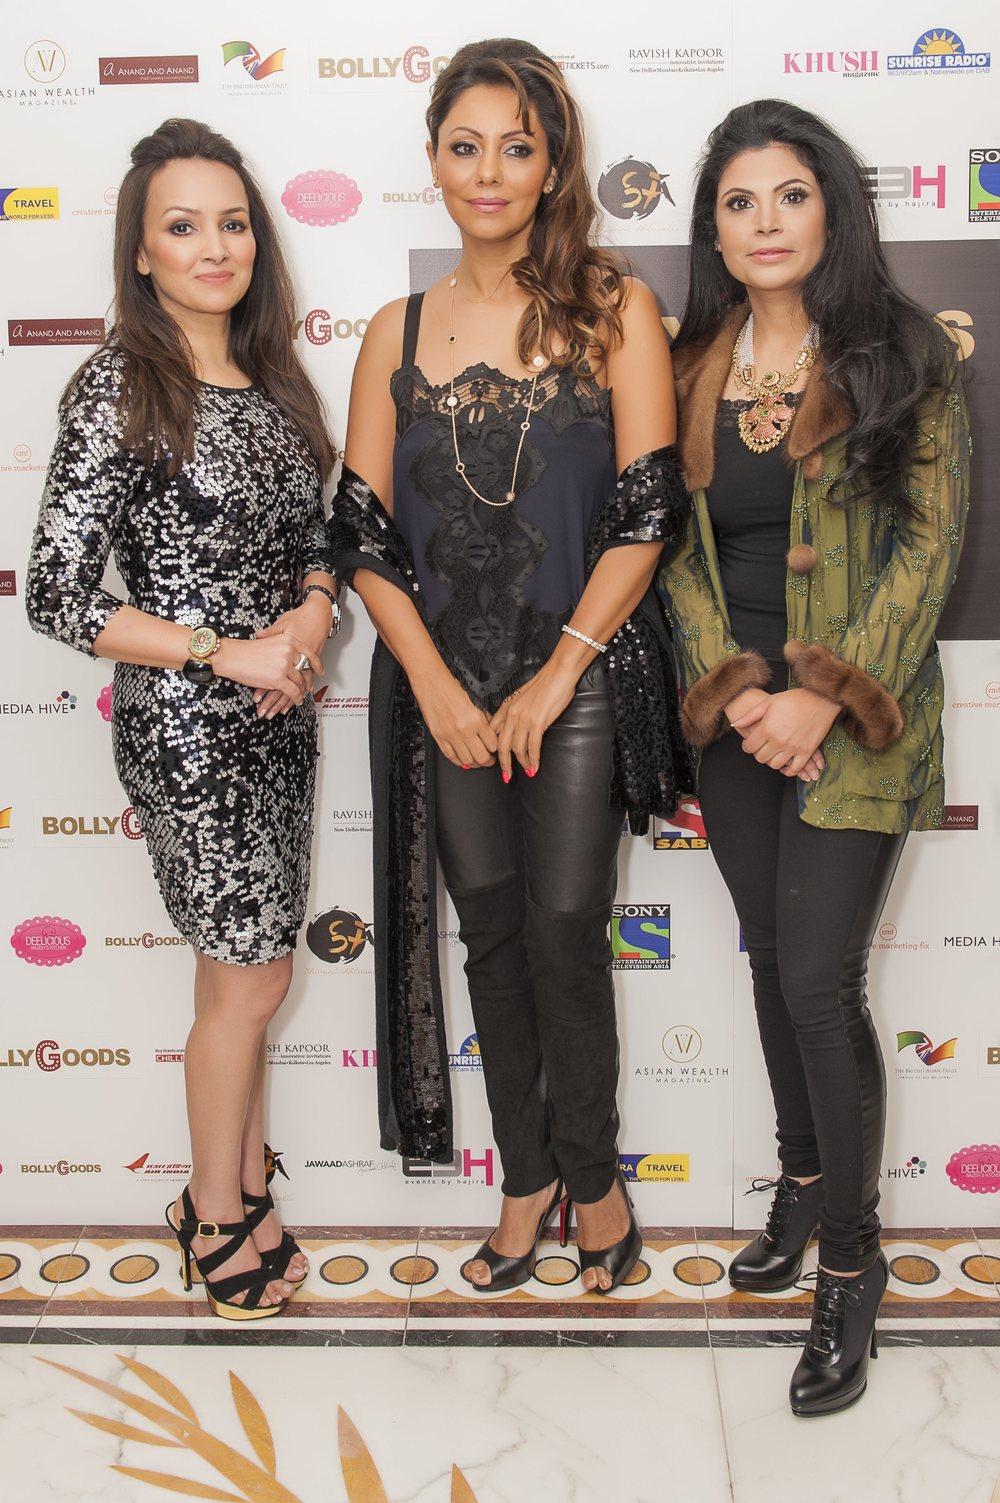 Promila Jain Bahri, Gauri Khan, Shivani Ahluwalia at BollyGoods Edition 2, London (photographer credit - Shahid Malik).jpg